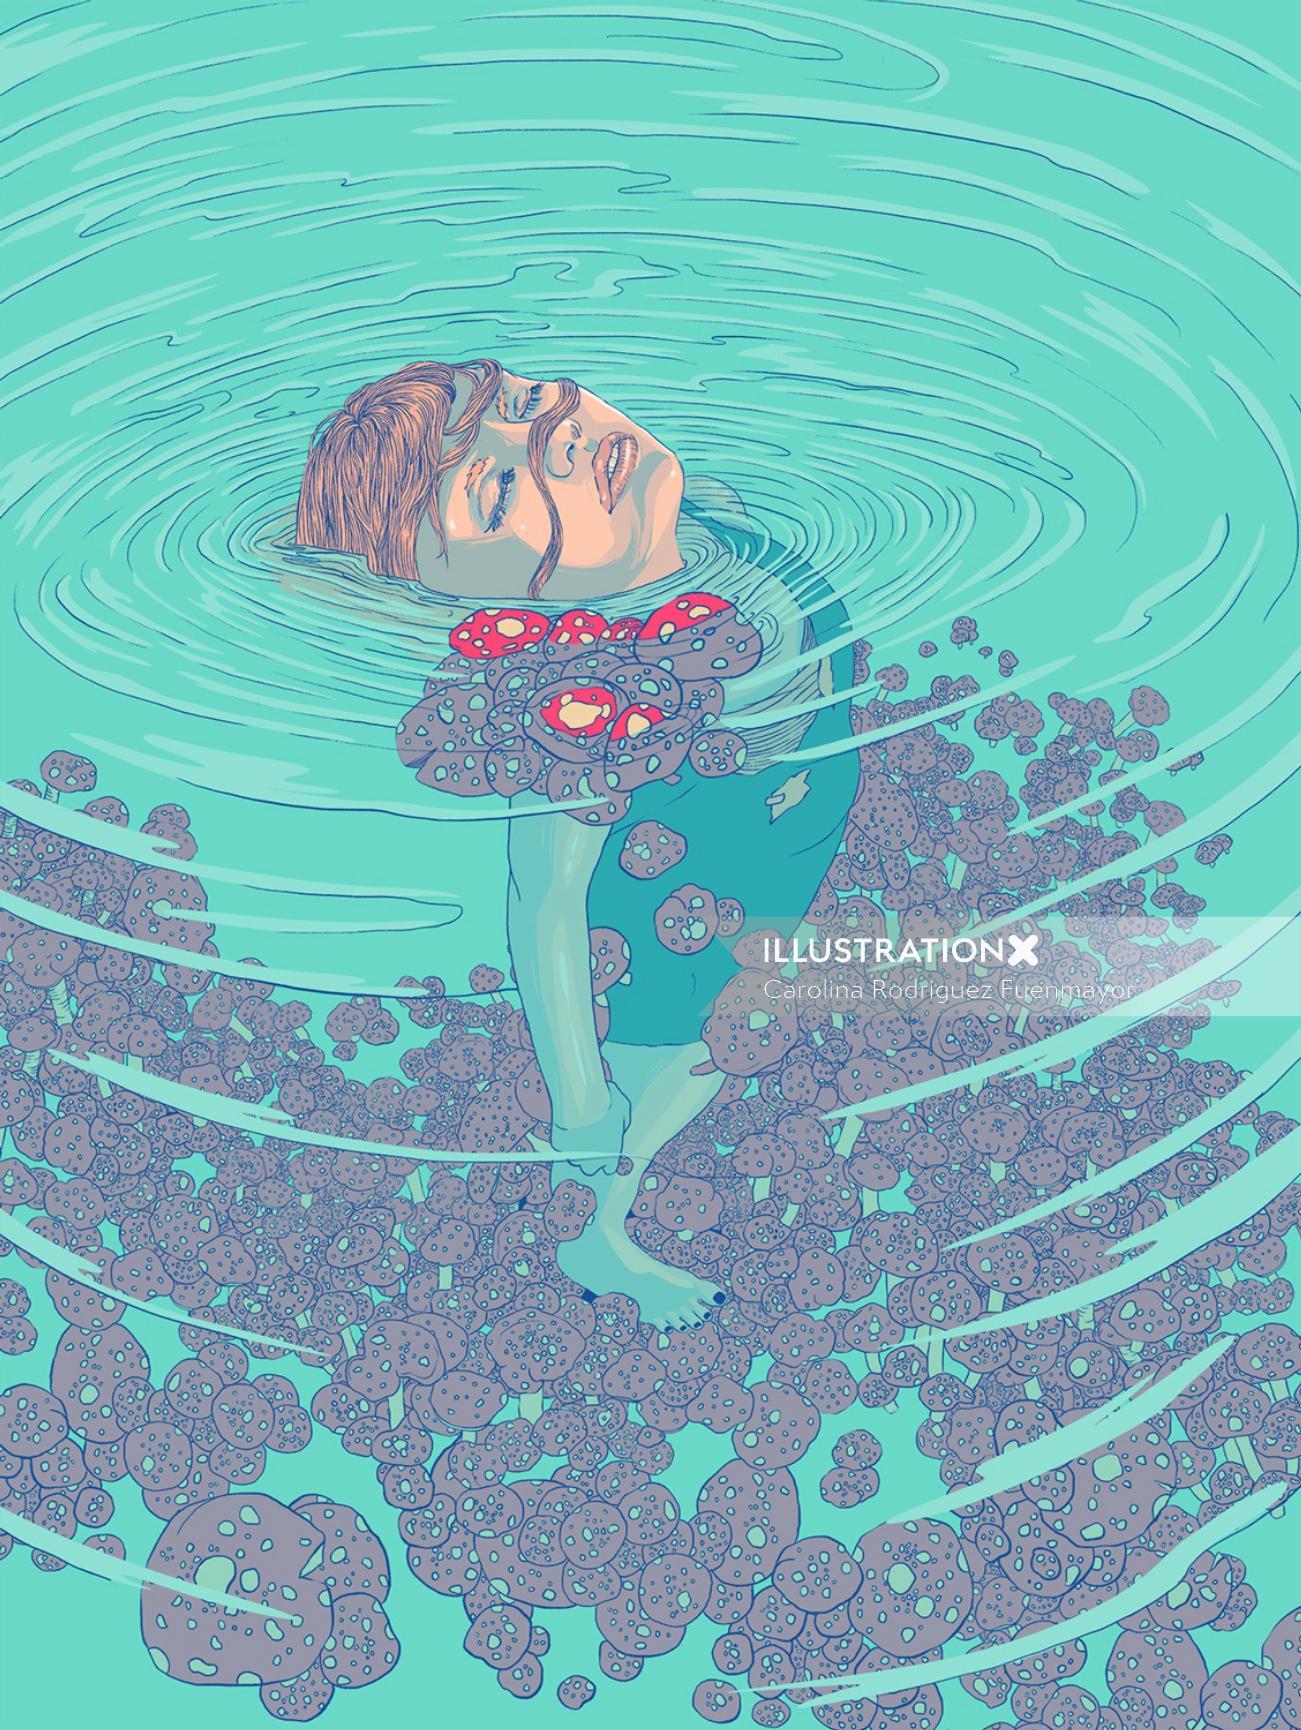 Drown girl lying on pool